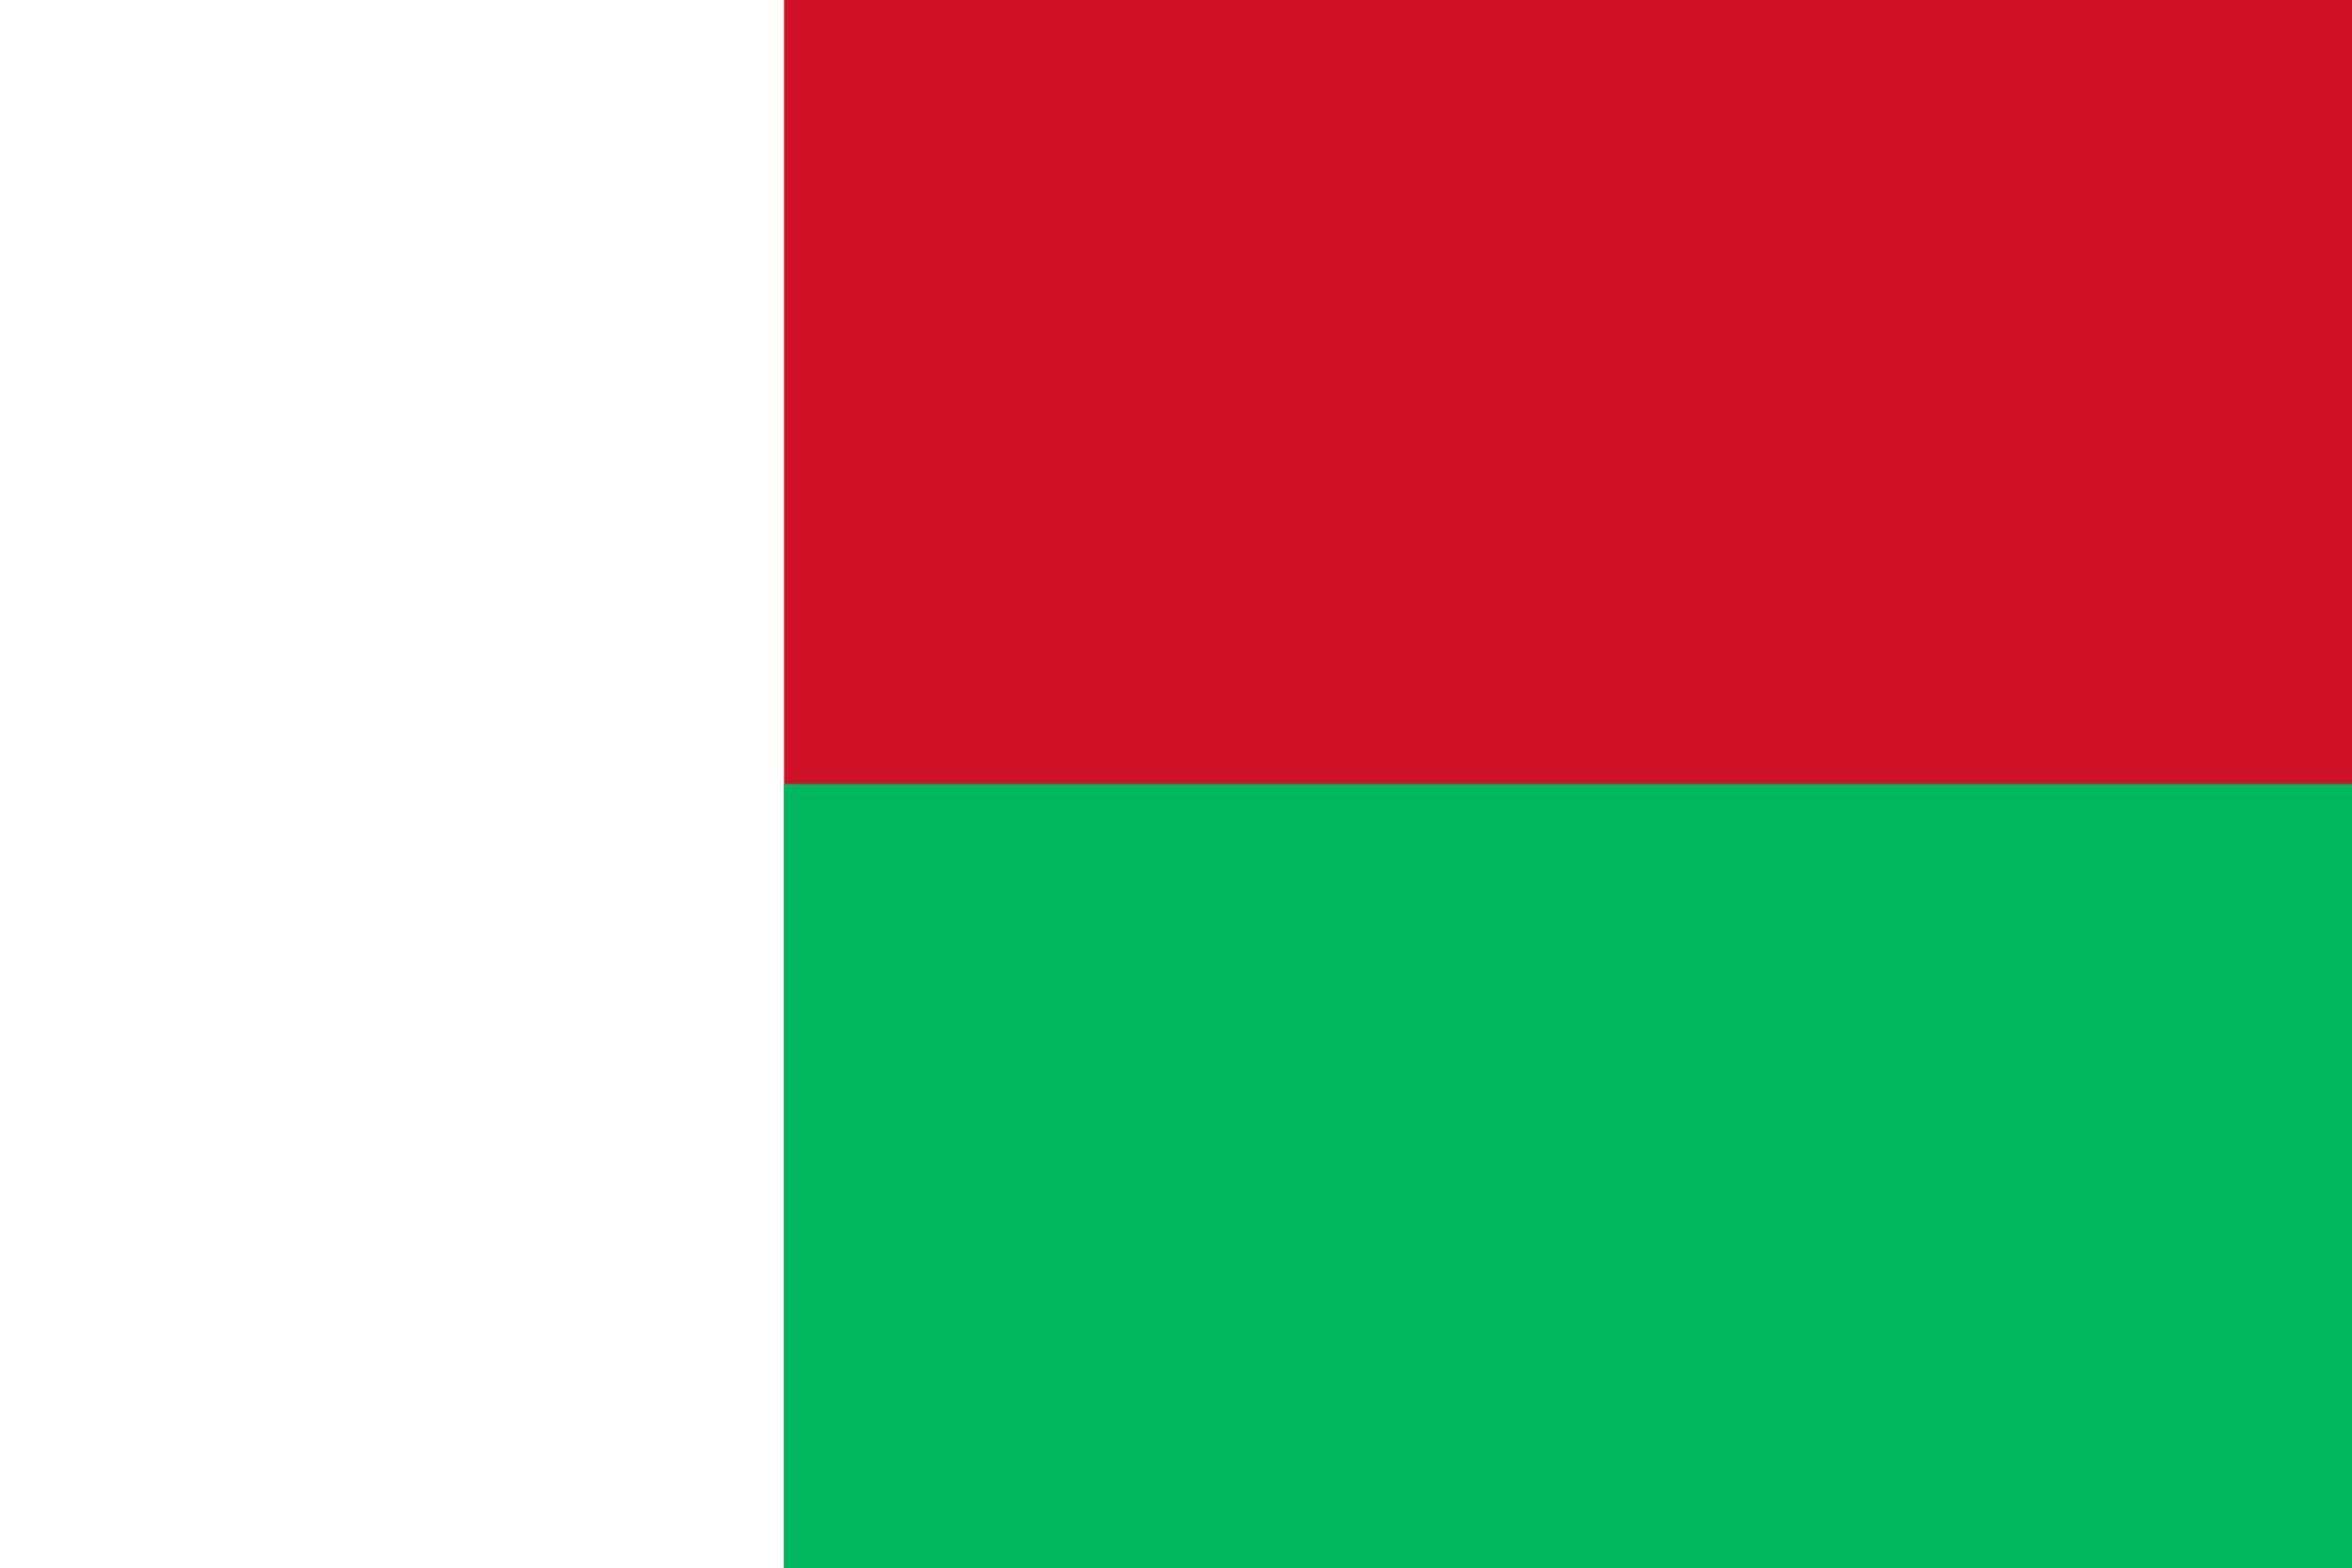 madagascar, país, emblema, insignia, σύμβολο - Wallpapers HD - Professor-falken.com